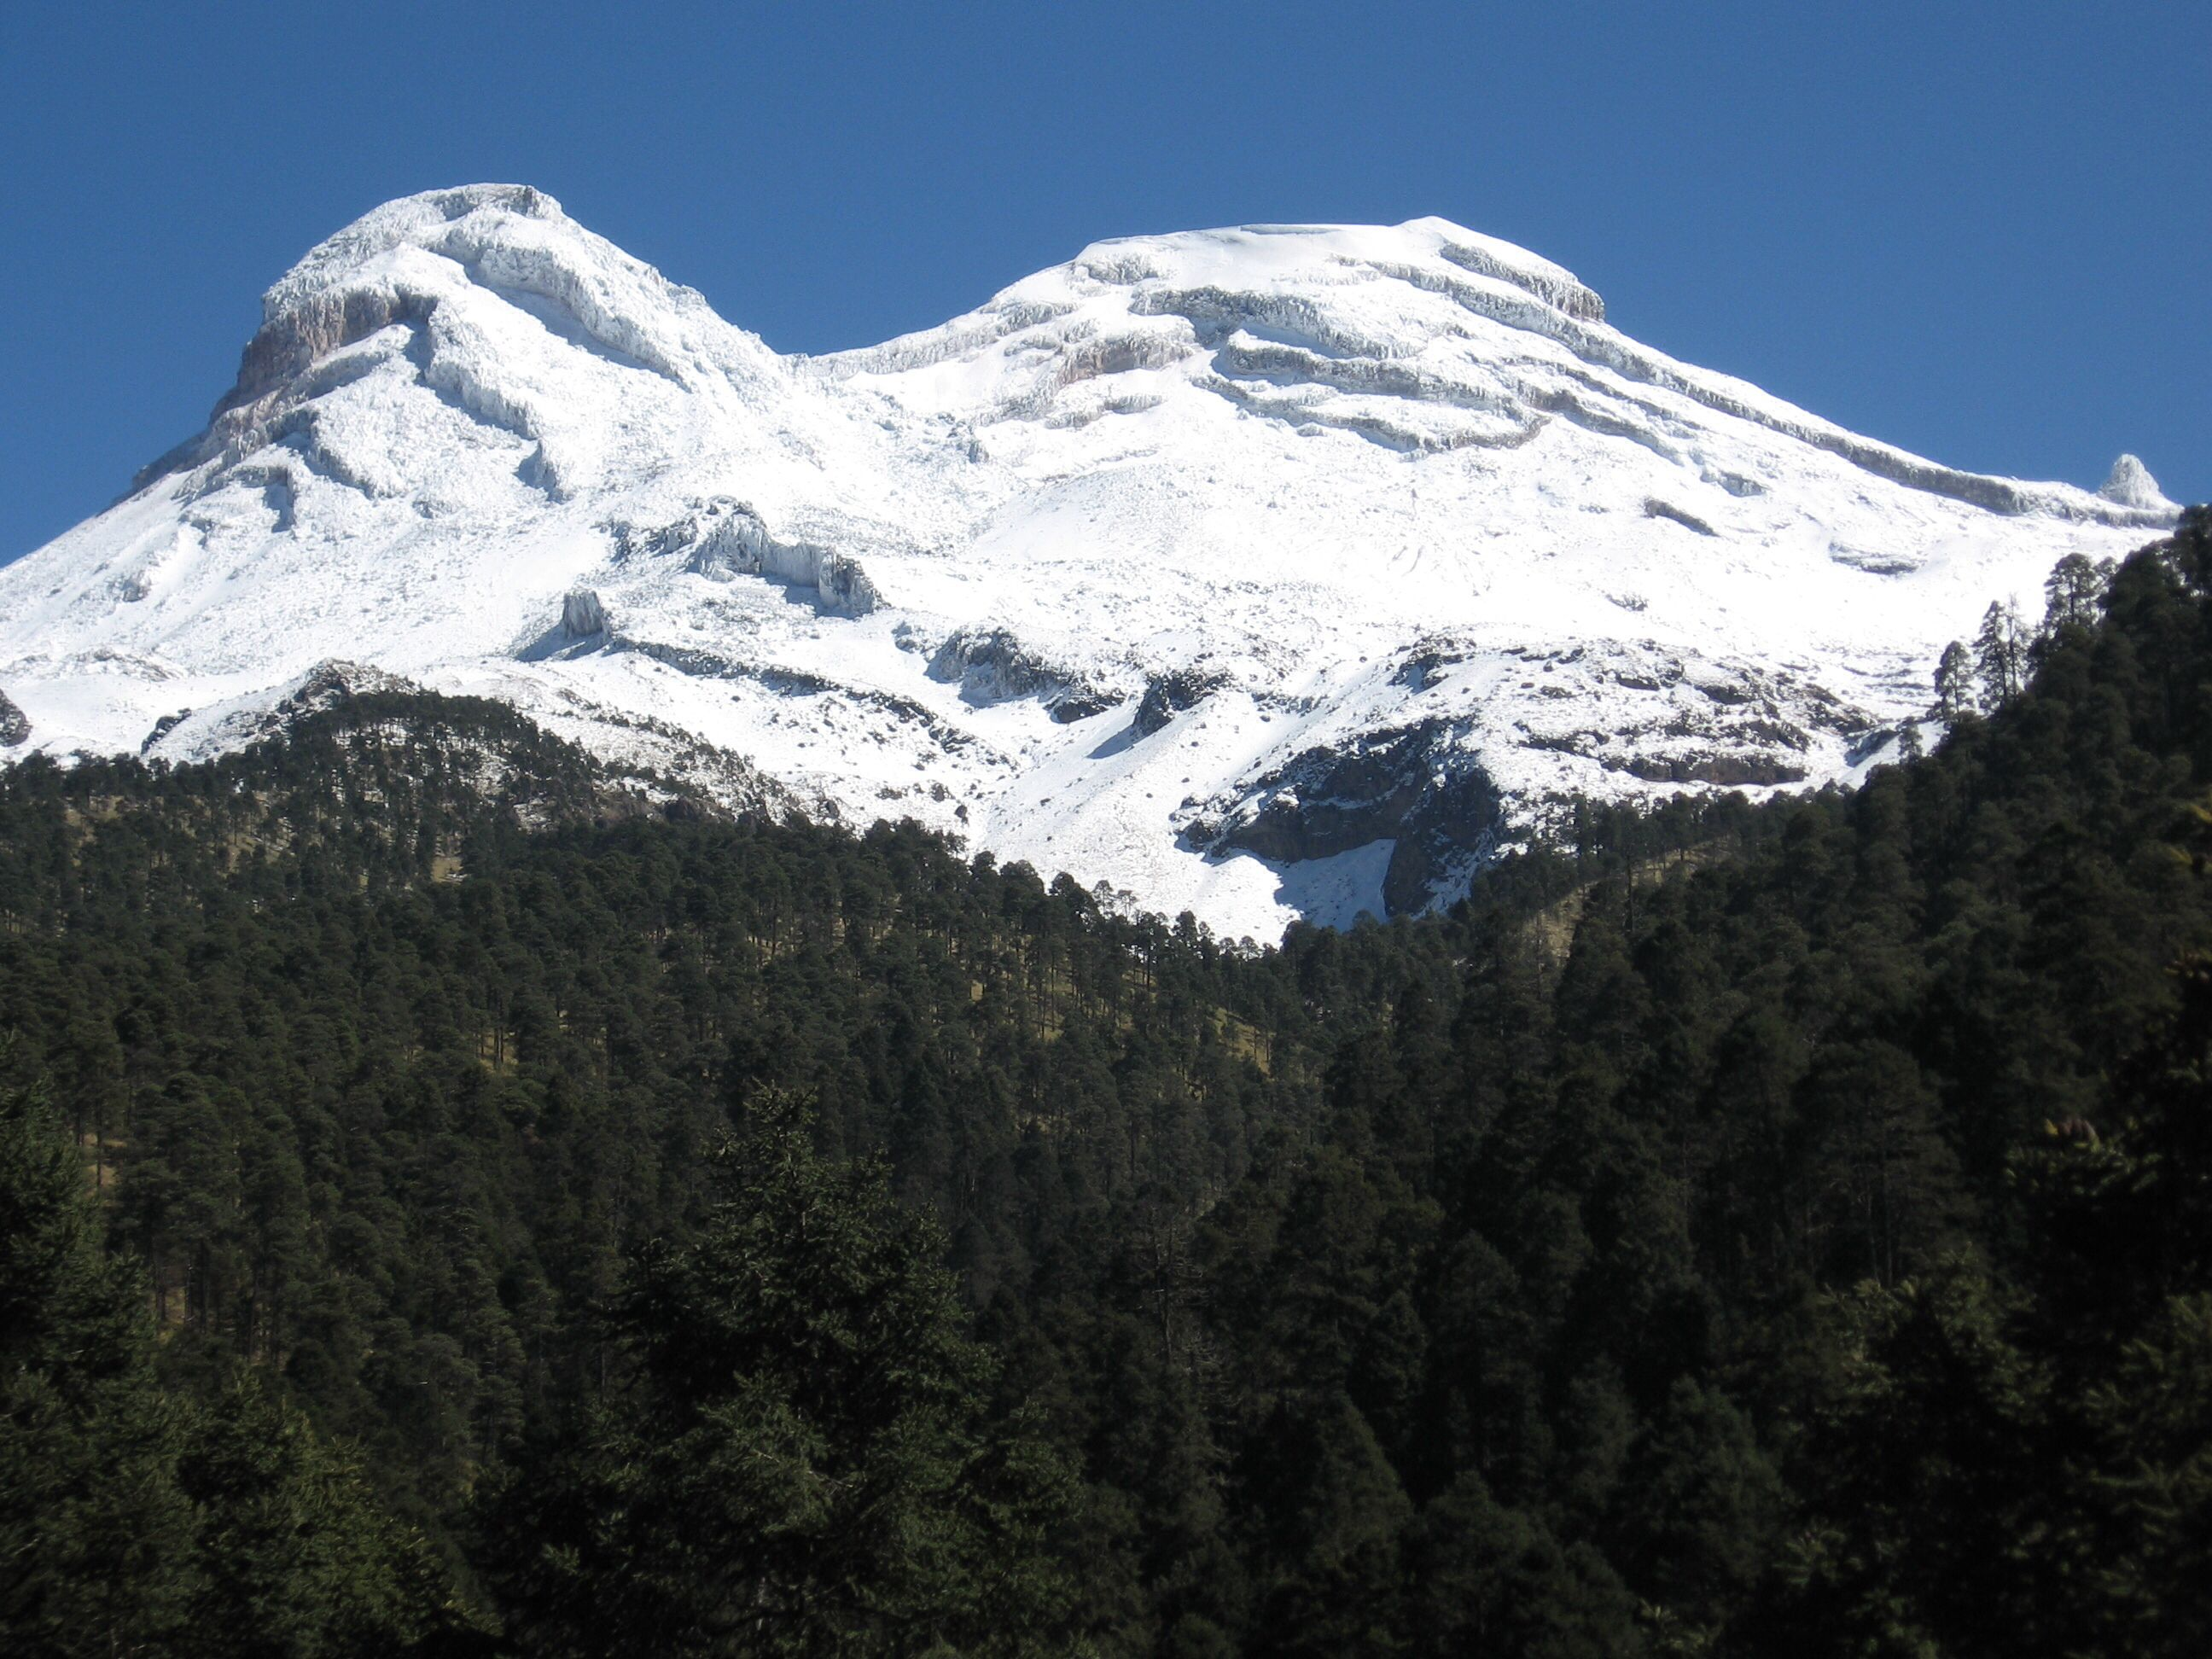 Iztaccihuatl : Climbing, Hiking & Mountaineering : SummitPost